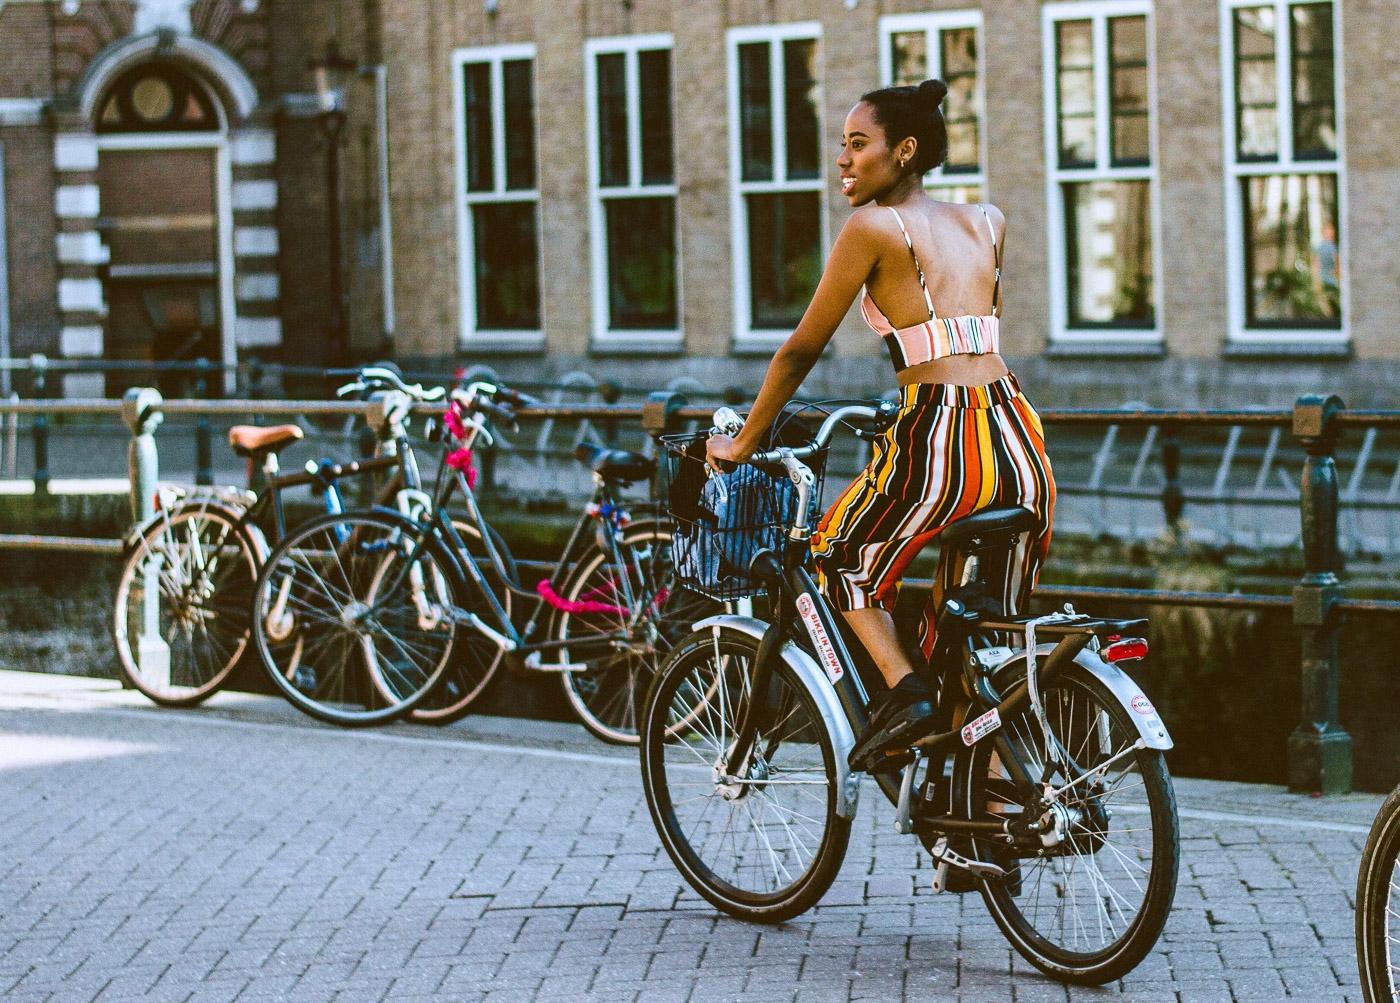 Chica en bicicleta paises bajos amsterdam